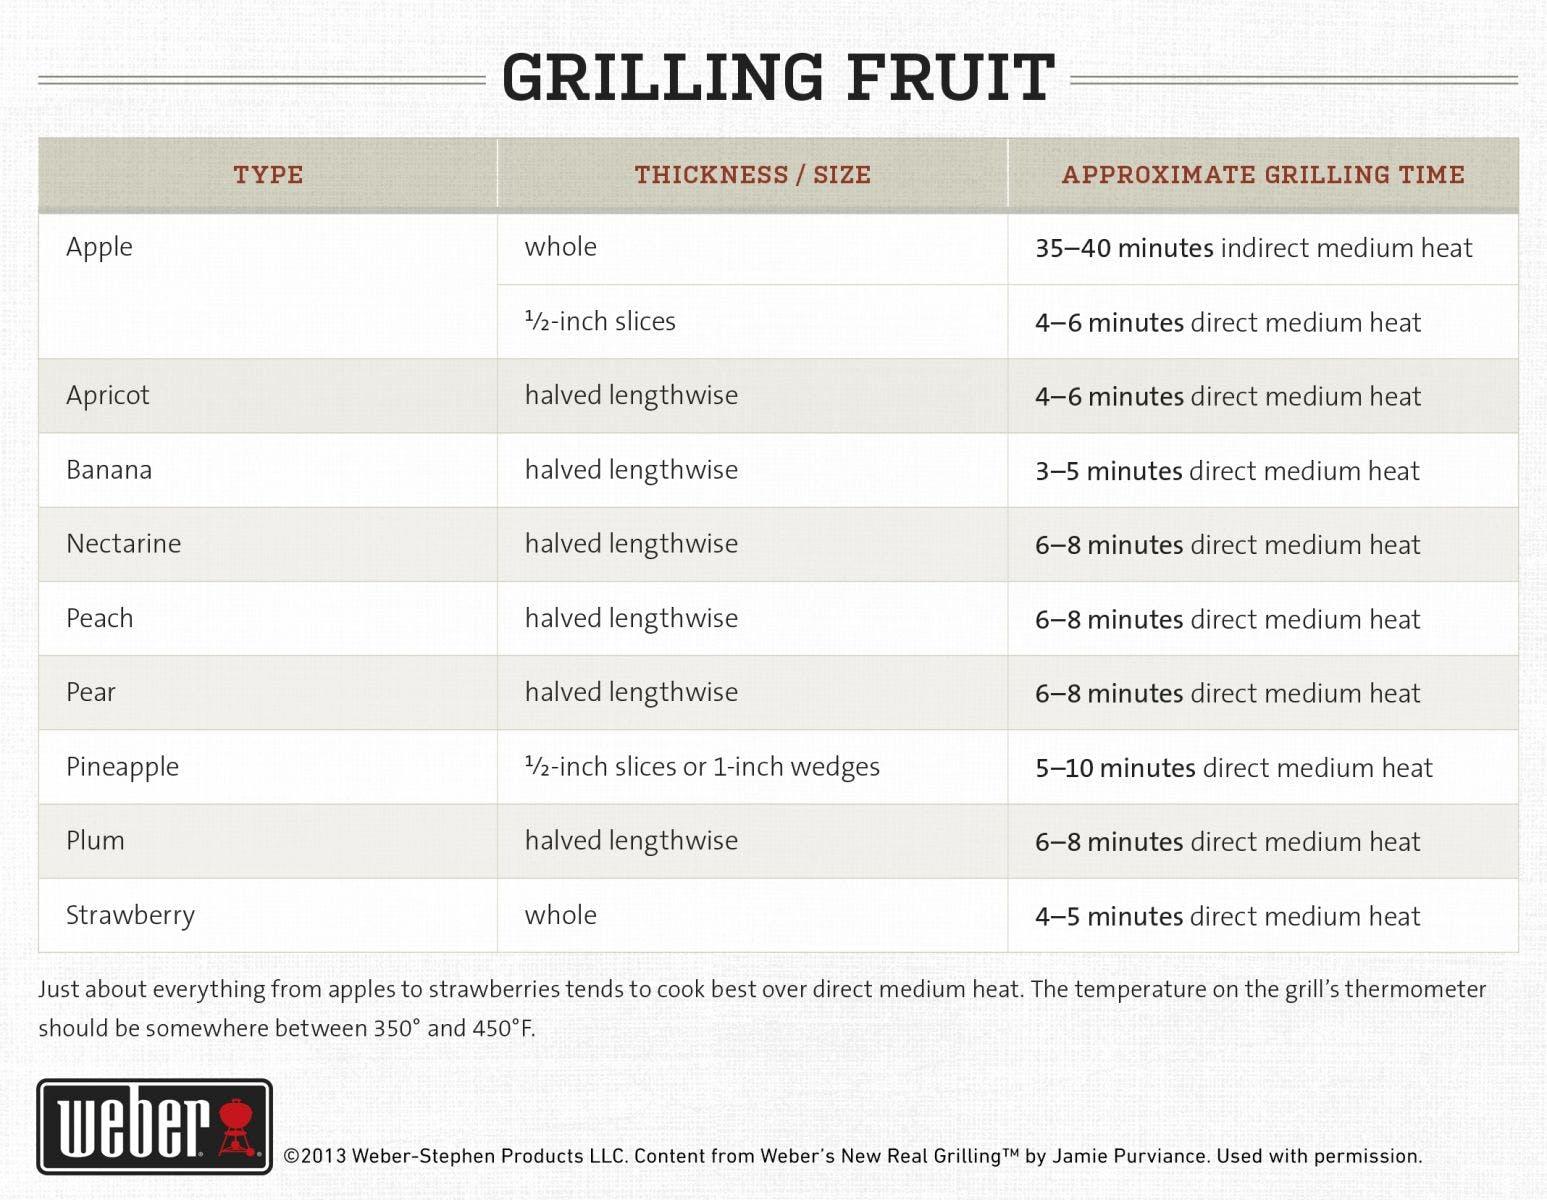 Fruit Grilling Guide